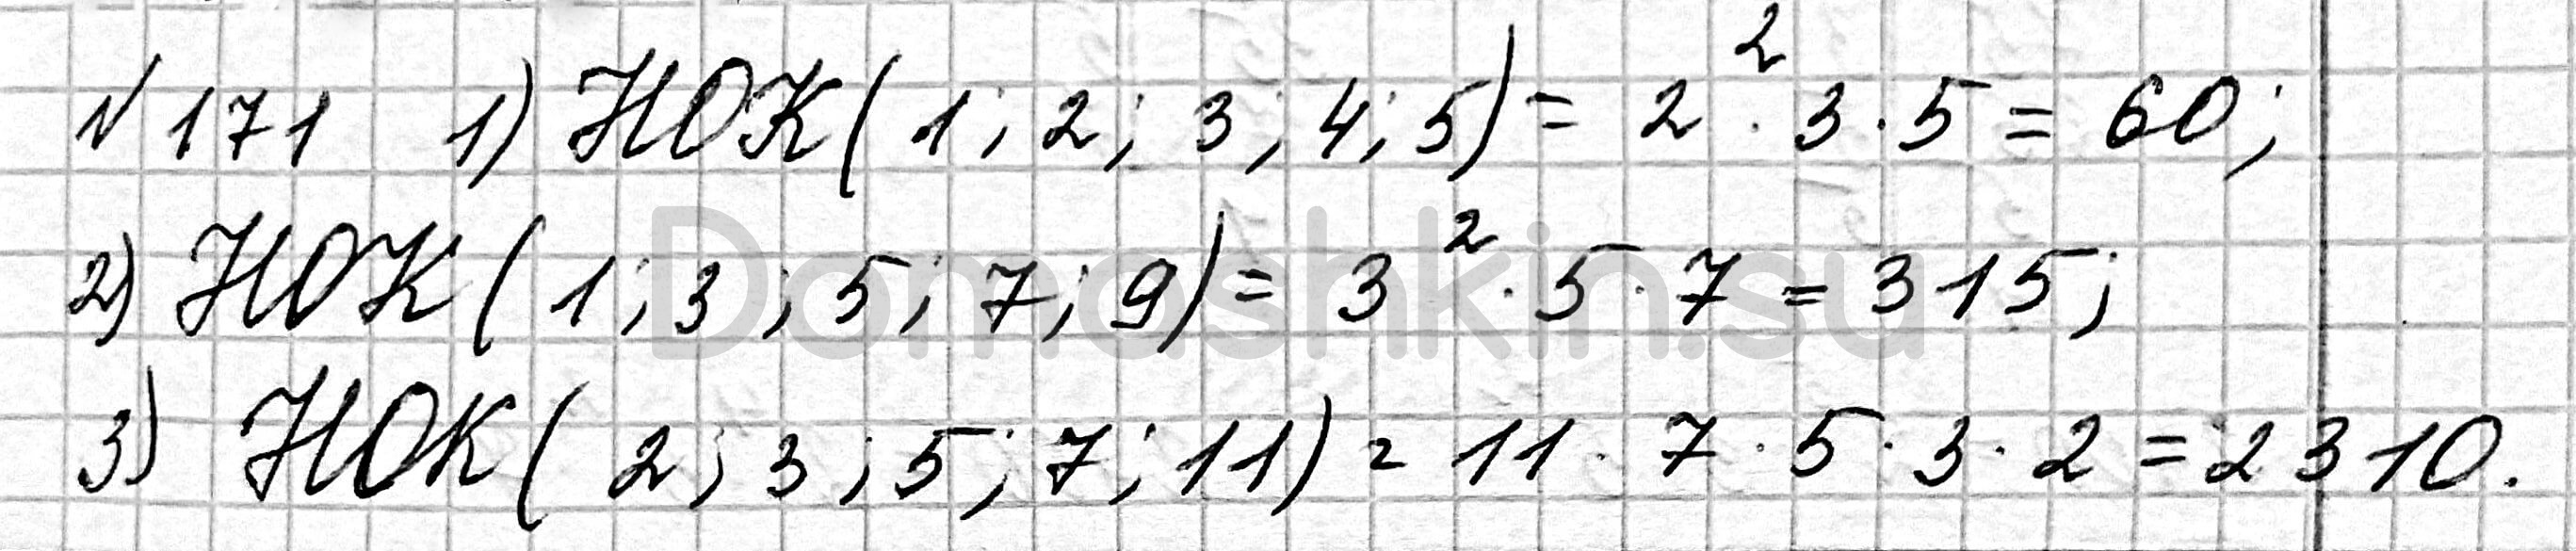 Математика 6 класс учебник Мерзляк номер 171 решение